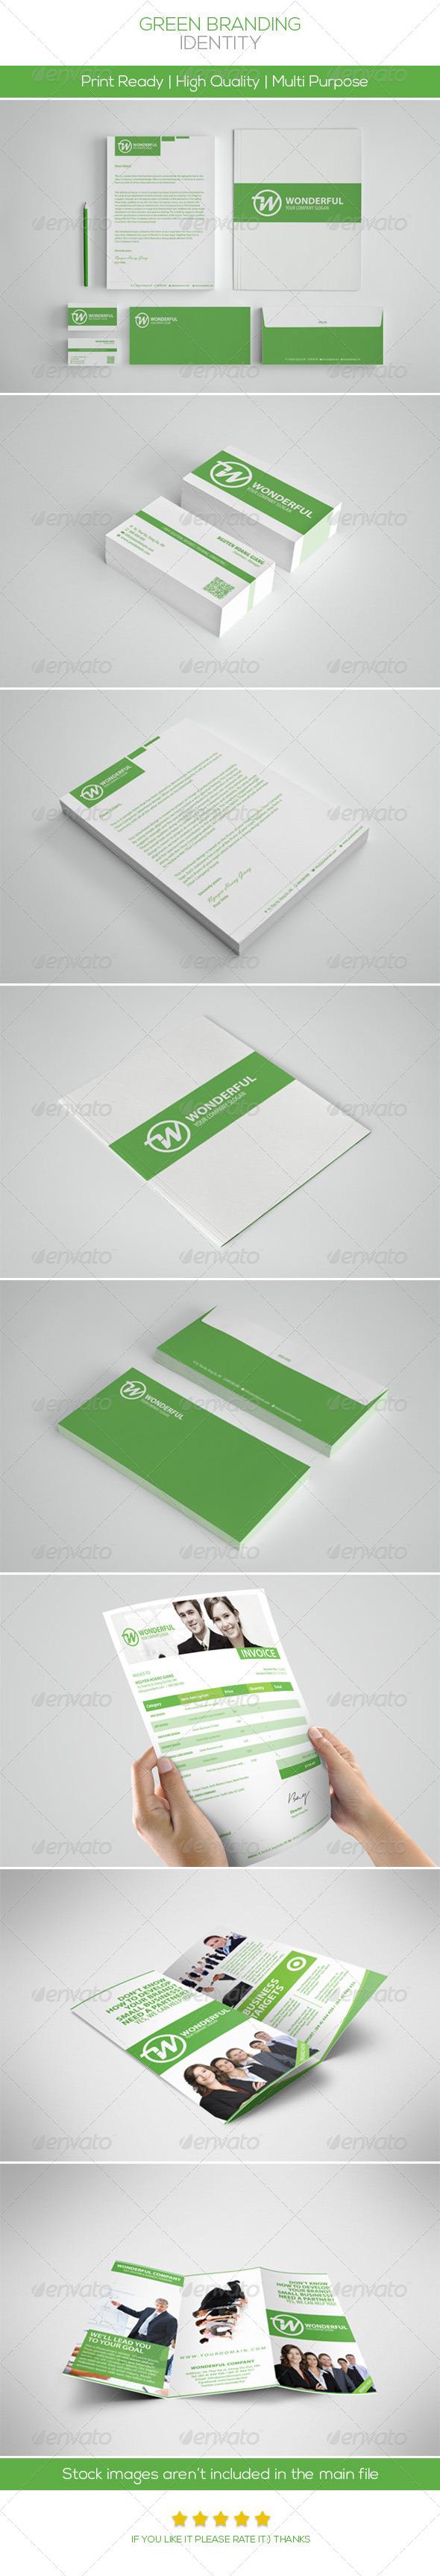 Green Branding Identity - Stationery Print Templates